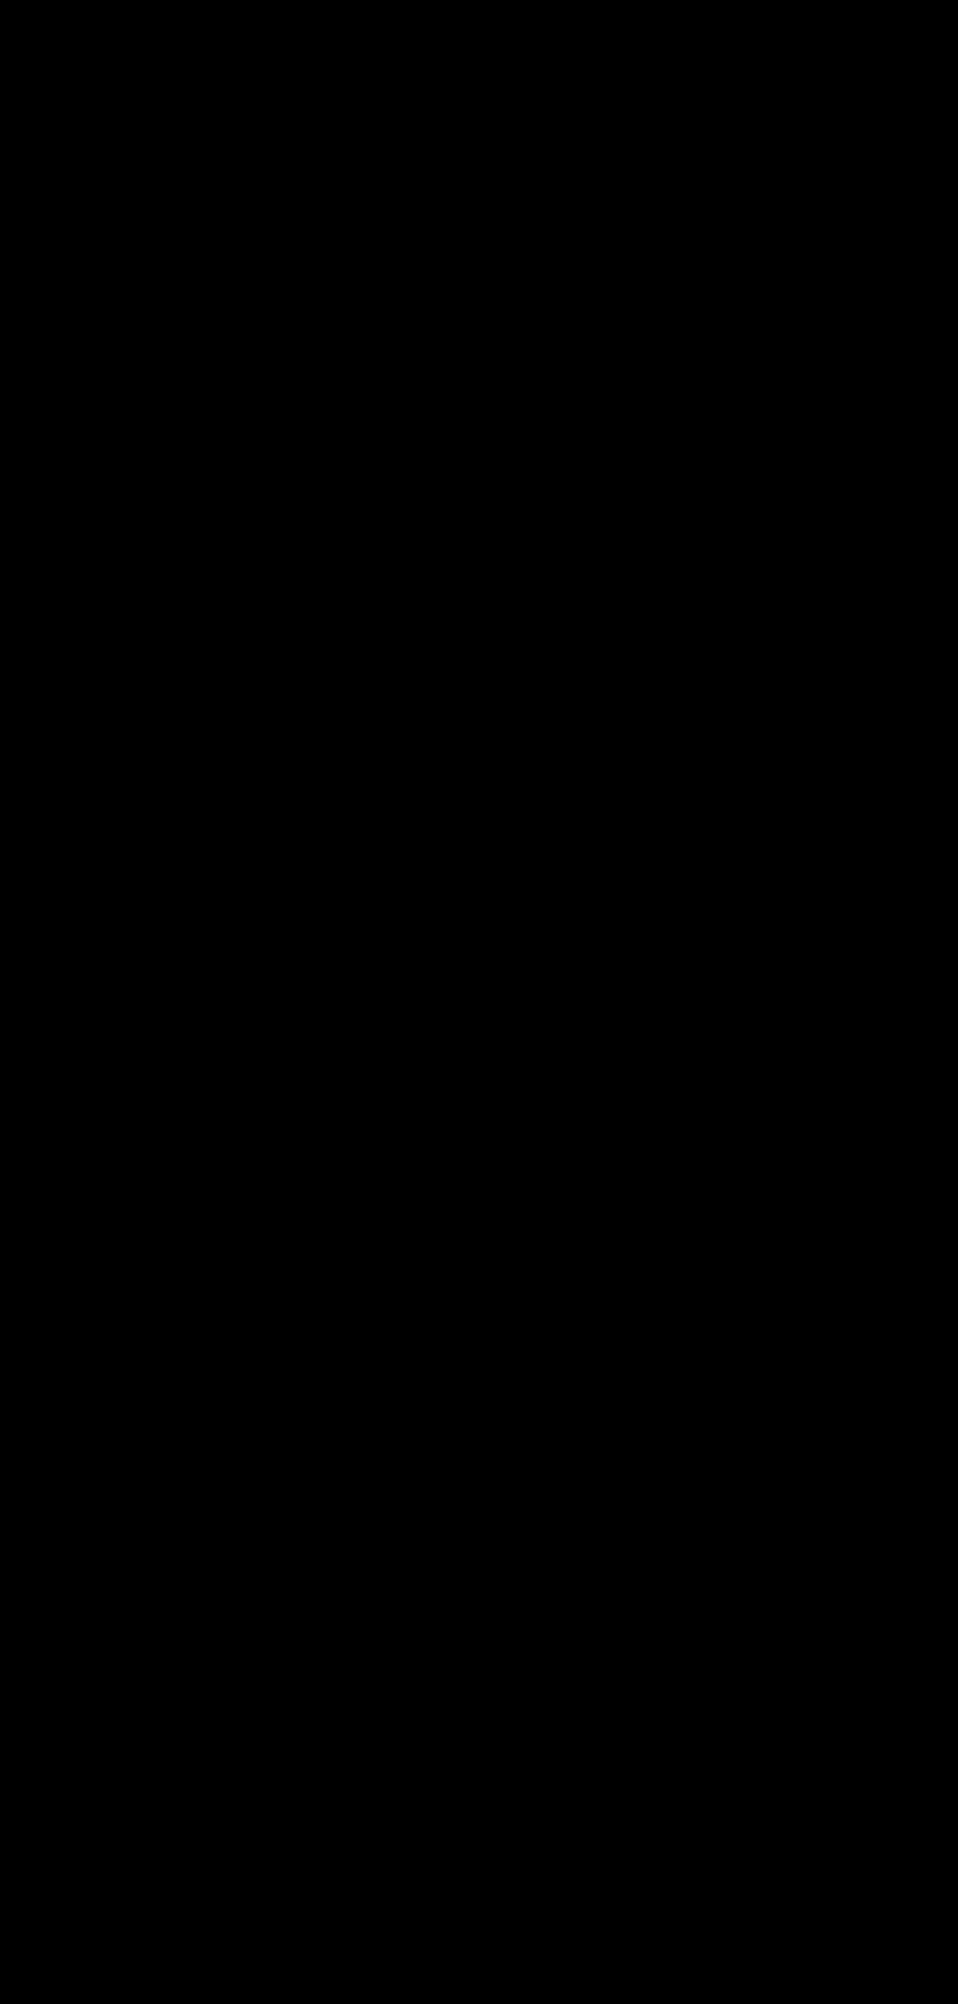 958x2004 Public Domain Clip Art Image Freestyle Soccer Silhouette Id